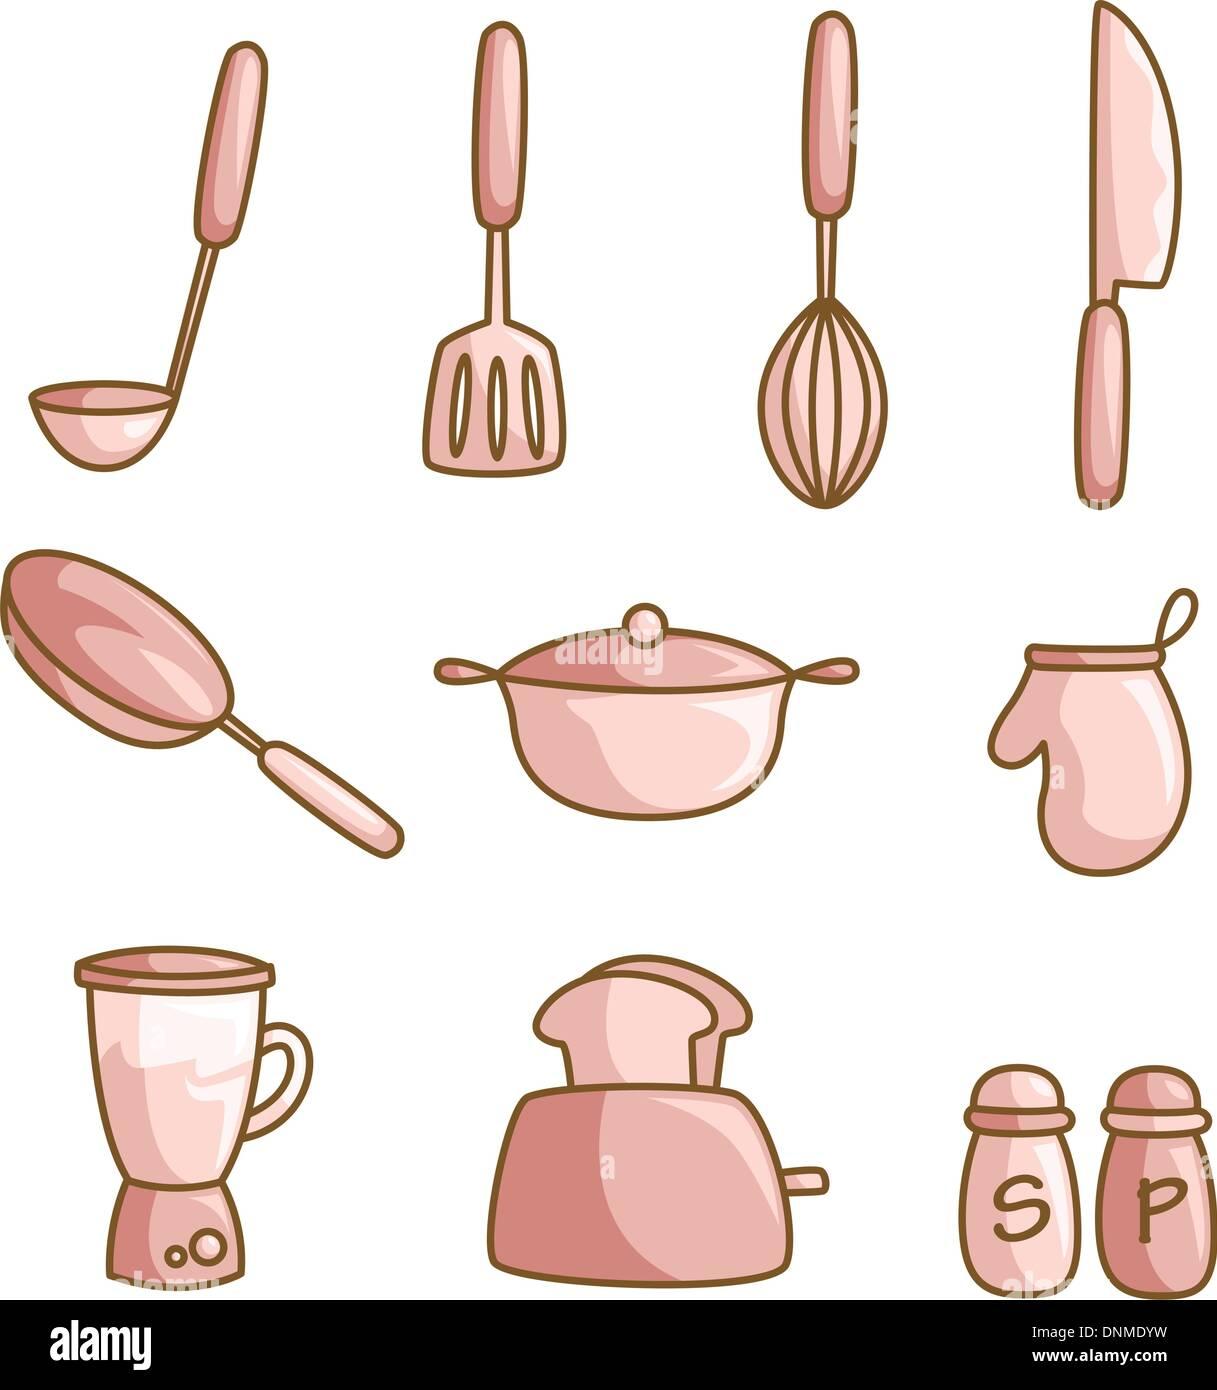 Kitchen Utensils Icons Set Cartoon Stock Photos Kitchen Utensils